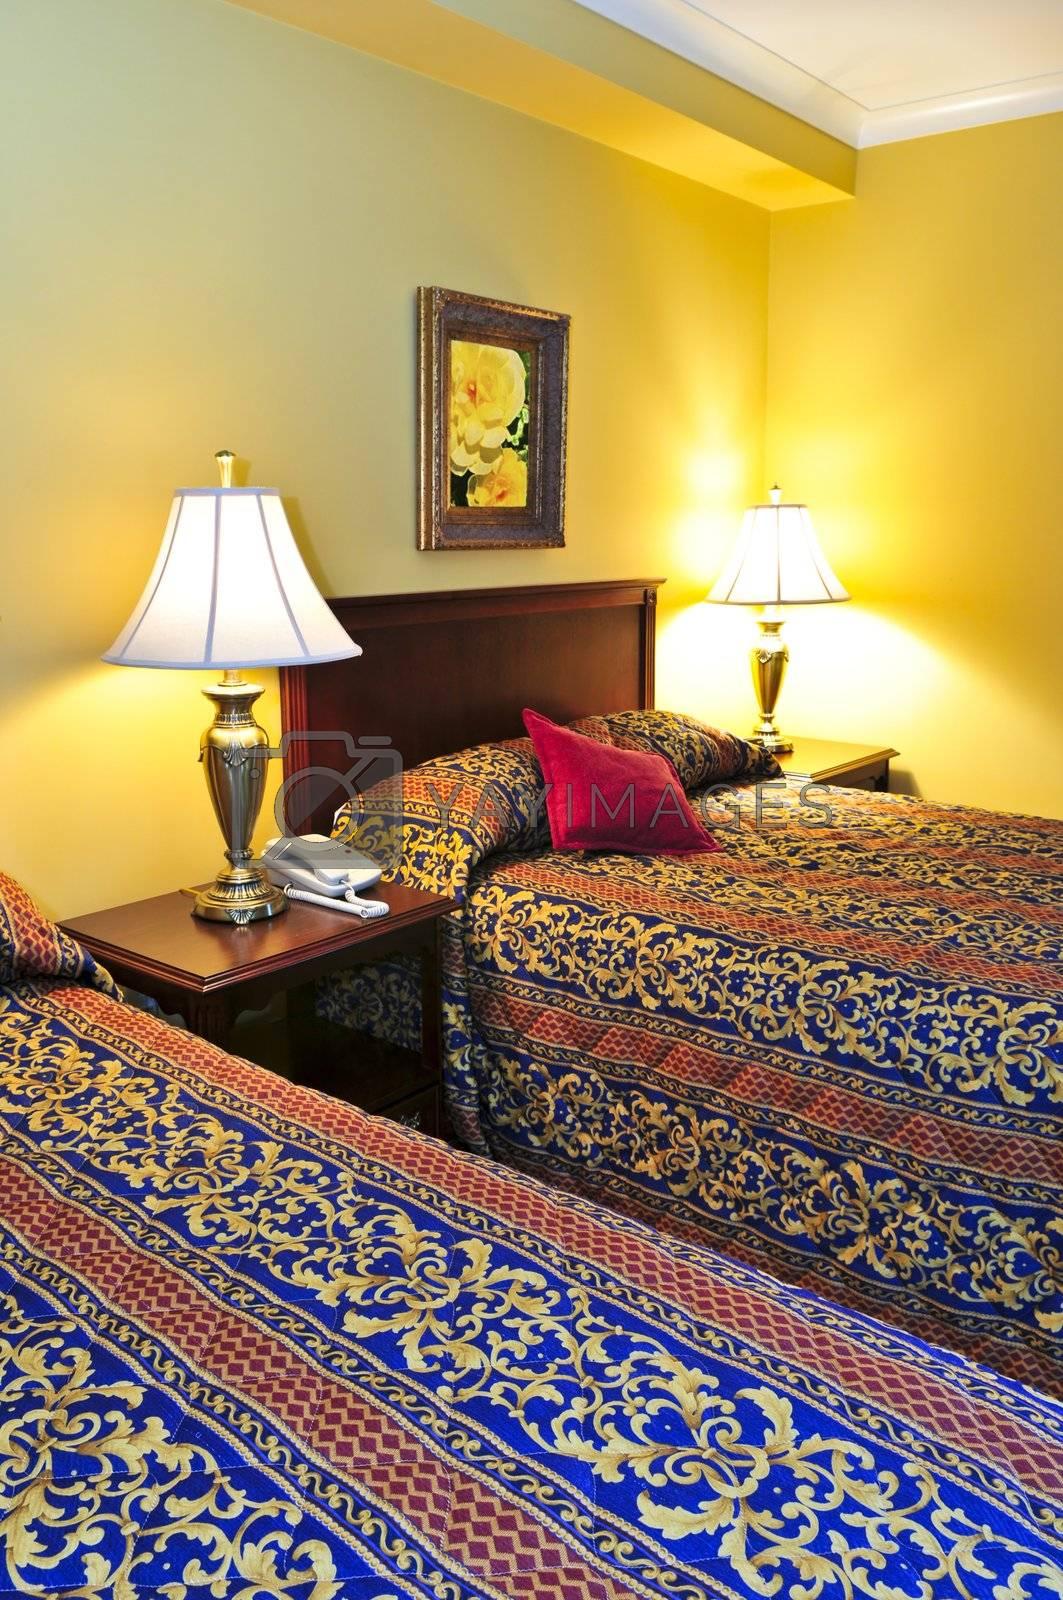 Bedroom interior by elenathewise